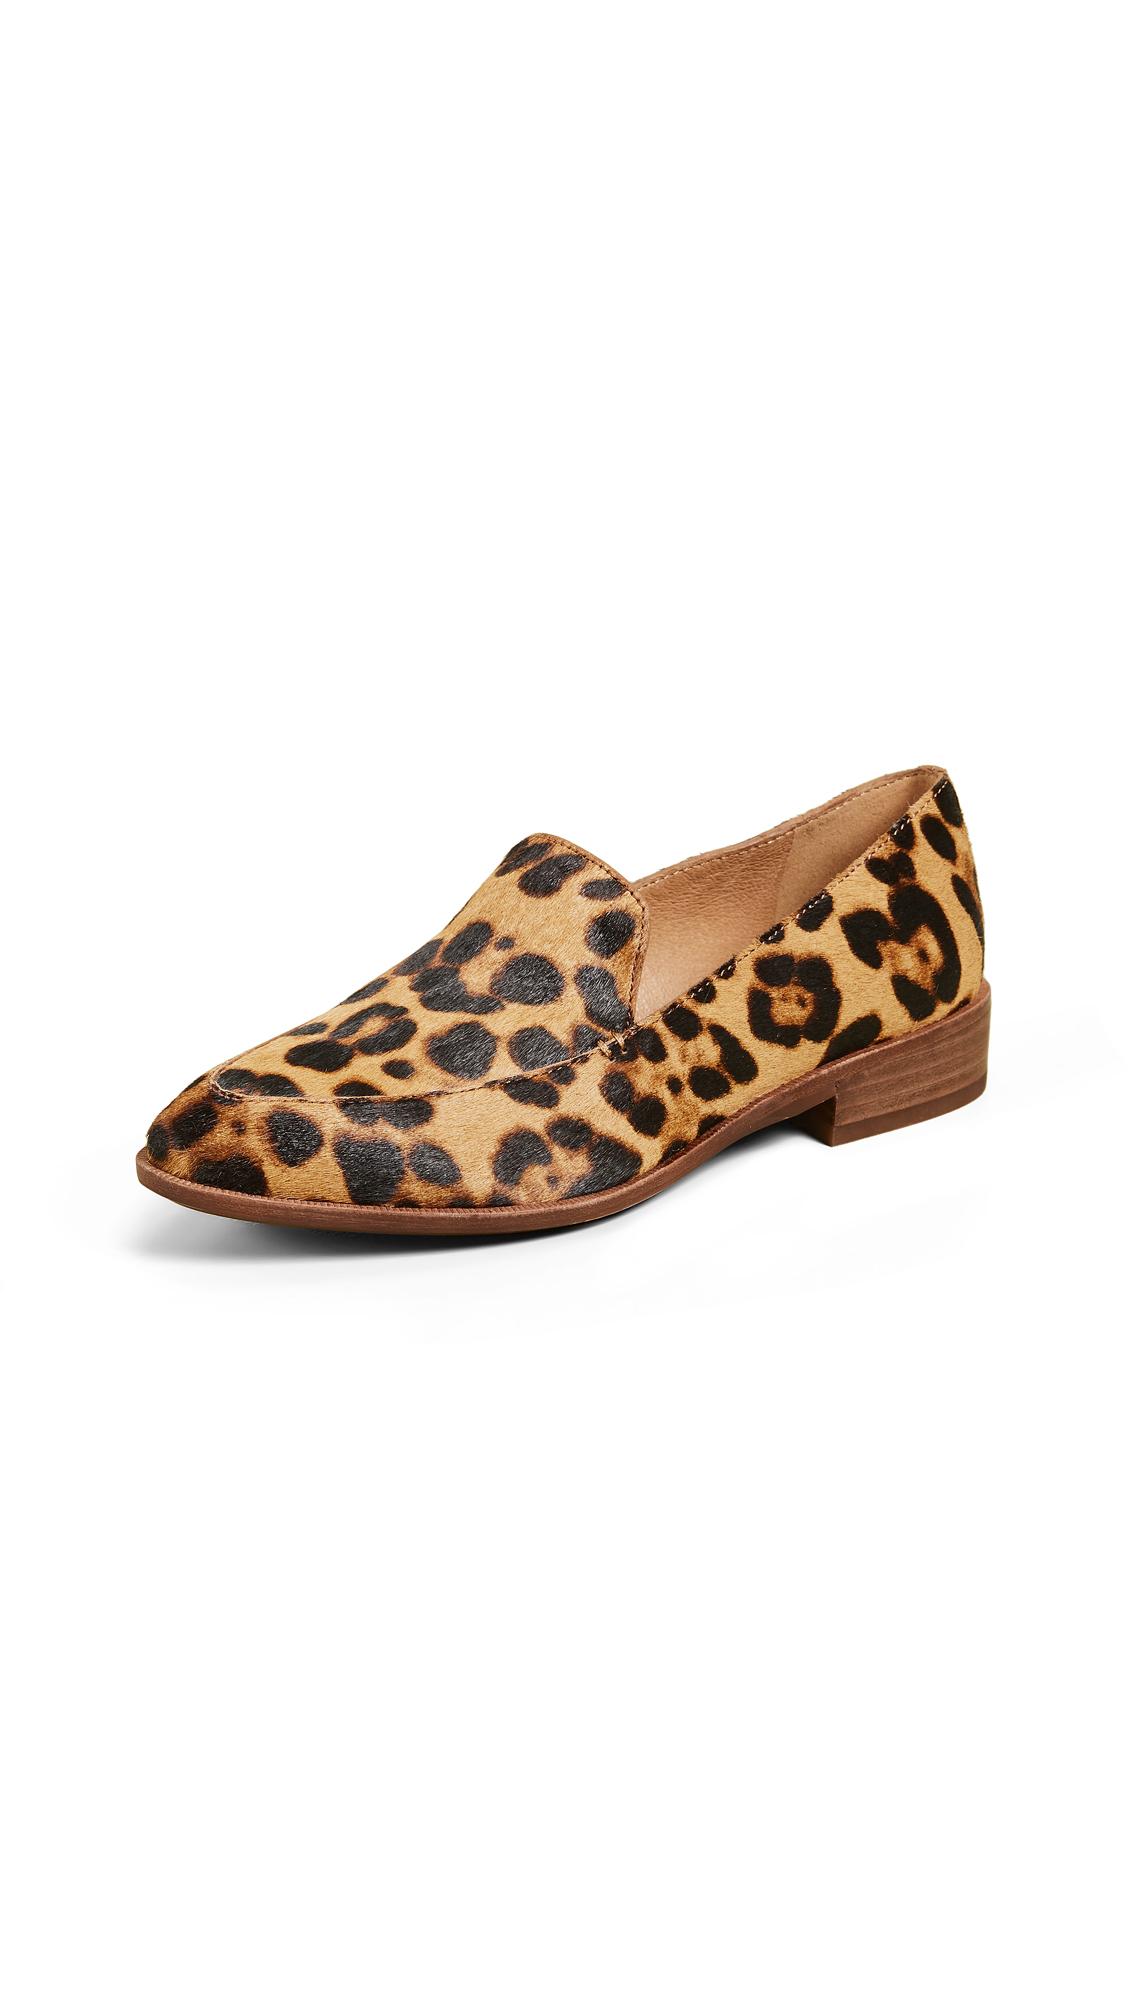 Madewell Frances Leopard Loafers - Truffle Multi